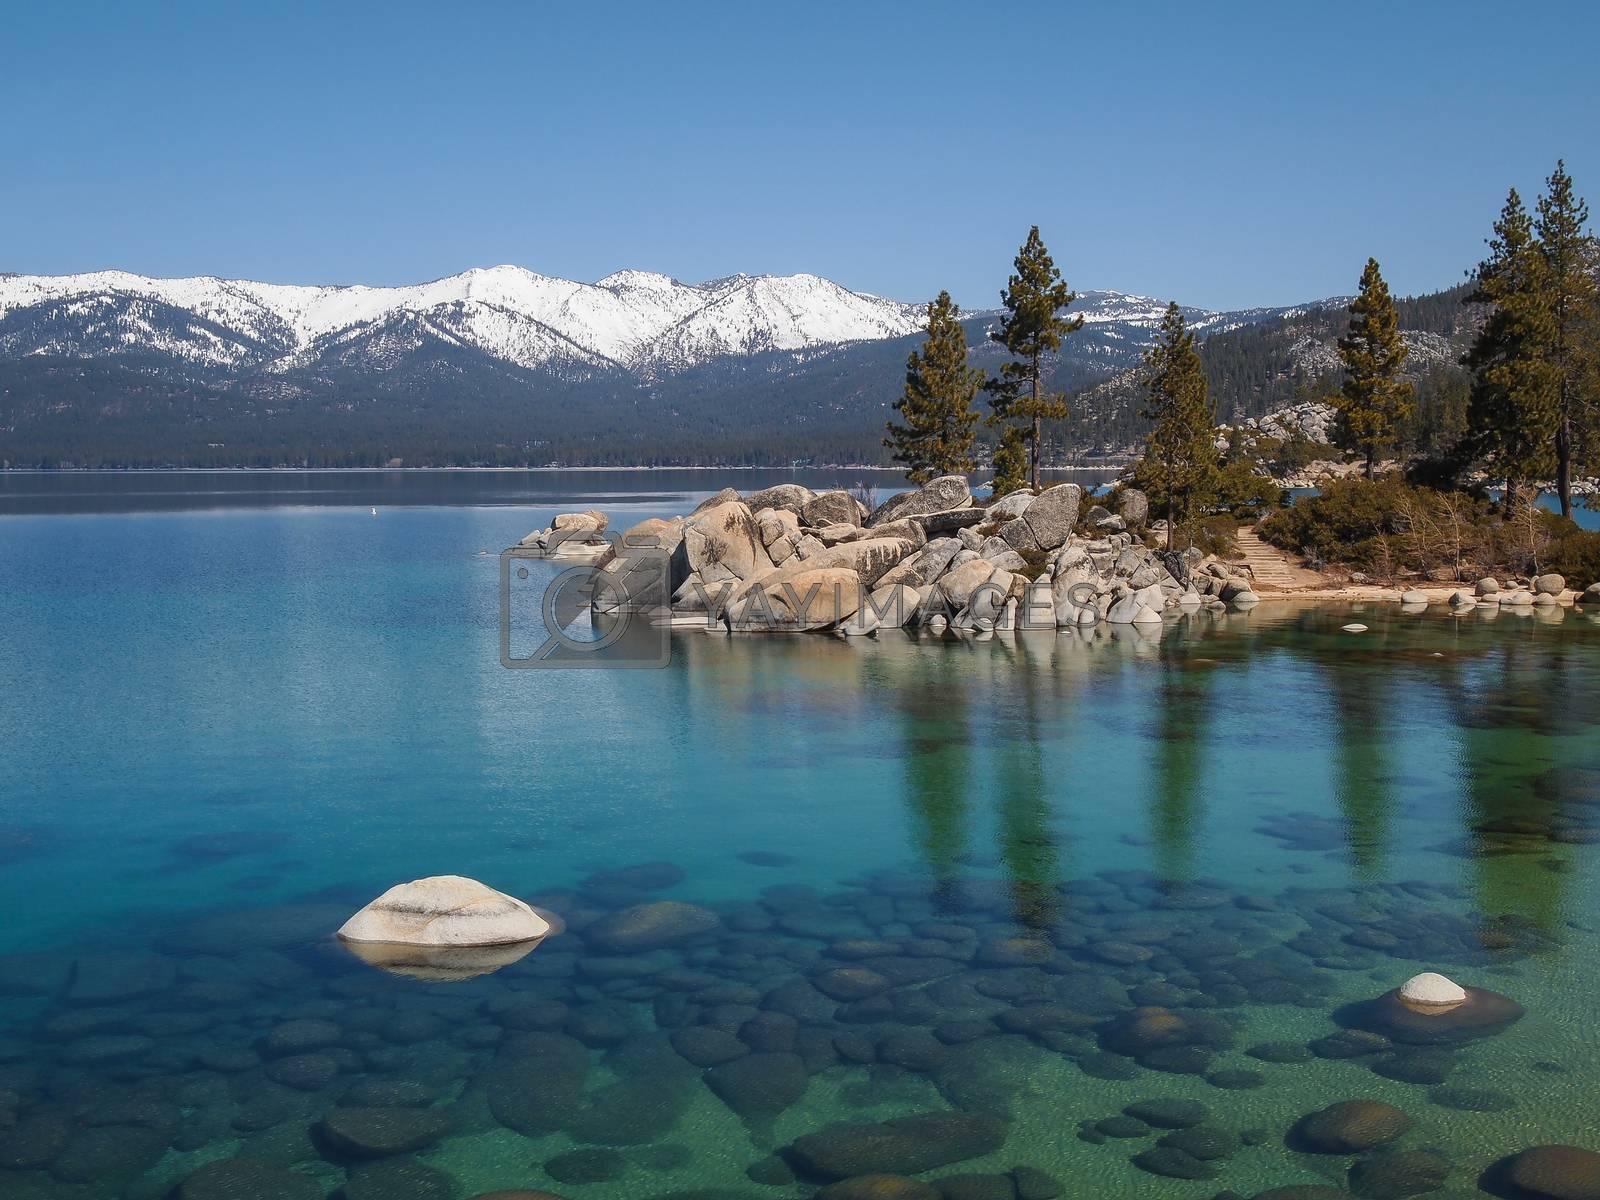 Landscape of Lake Tahoe by simpleBE